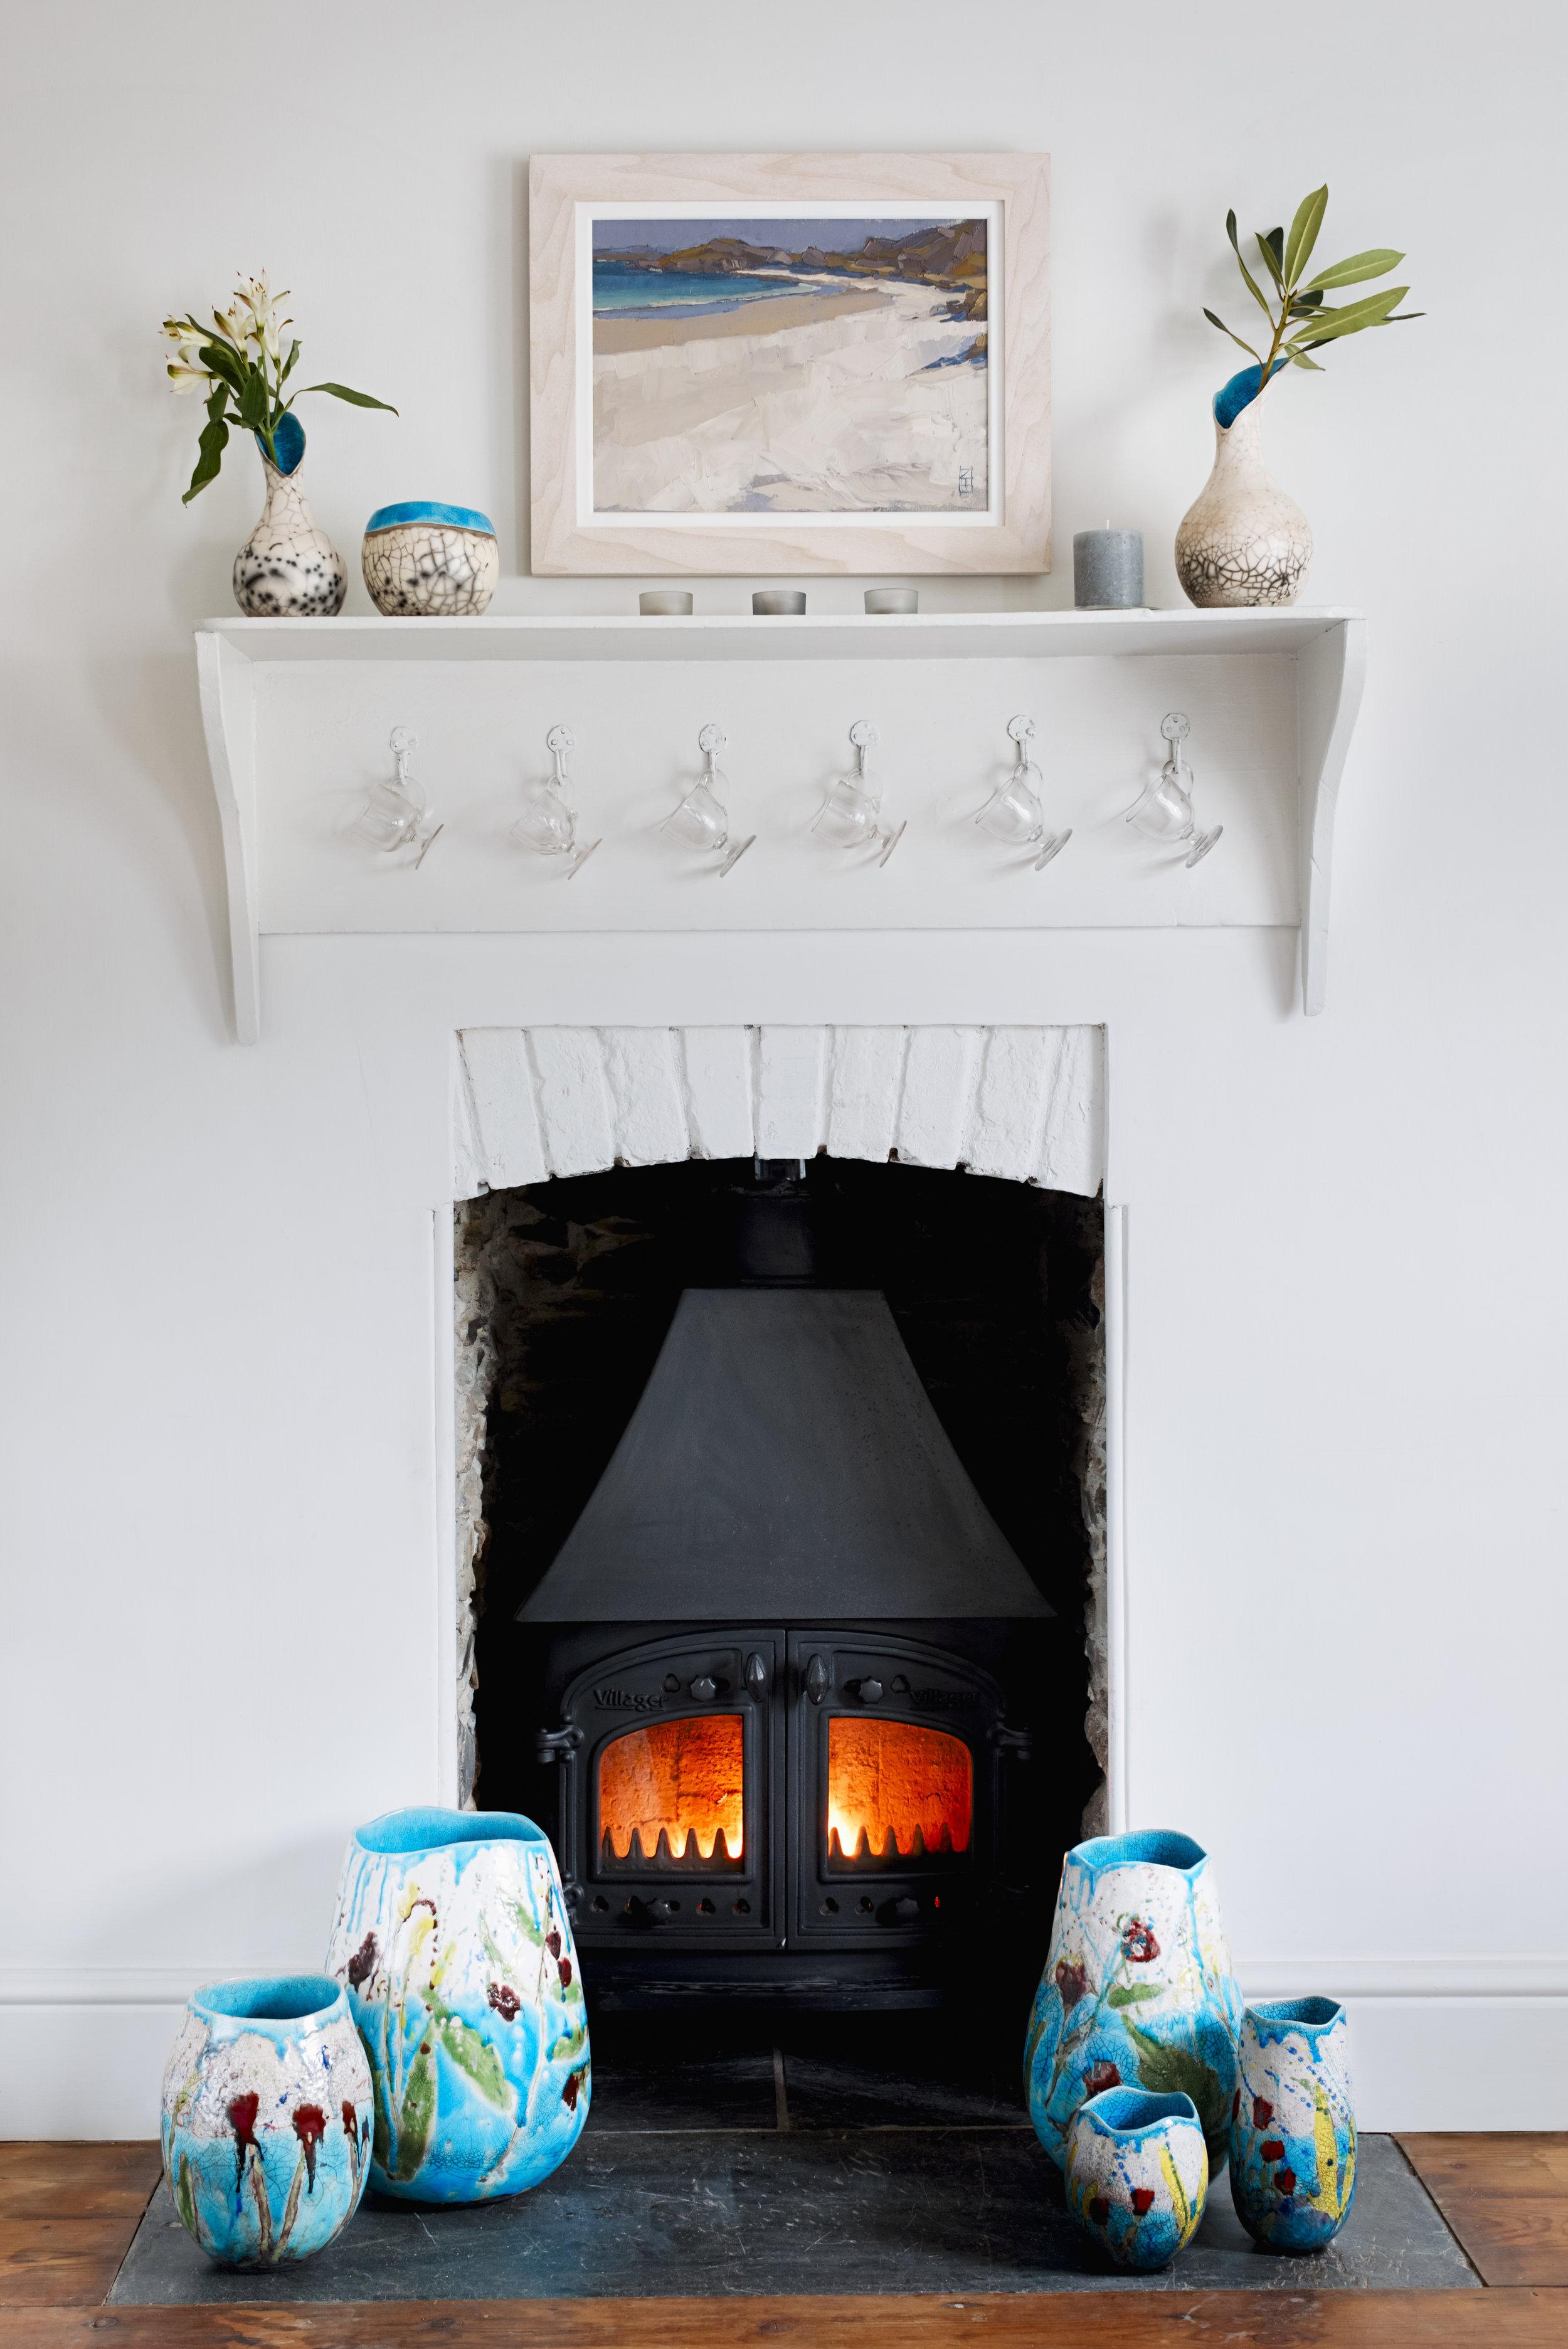 Pots by fireplace_Lucktaylor Ceramics.jpg